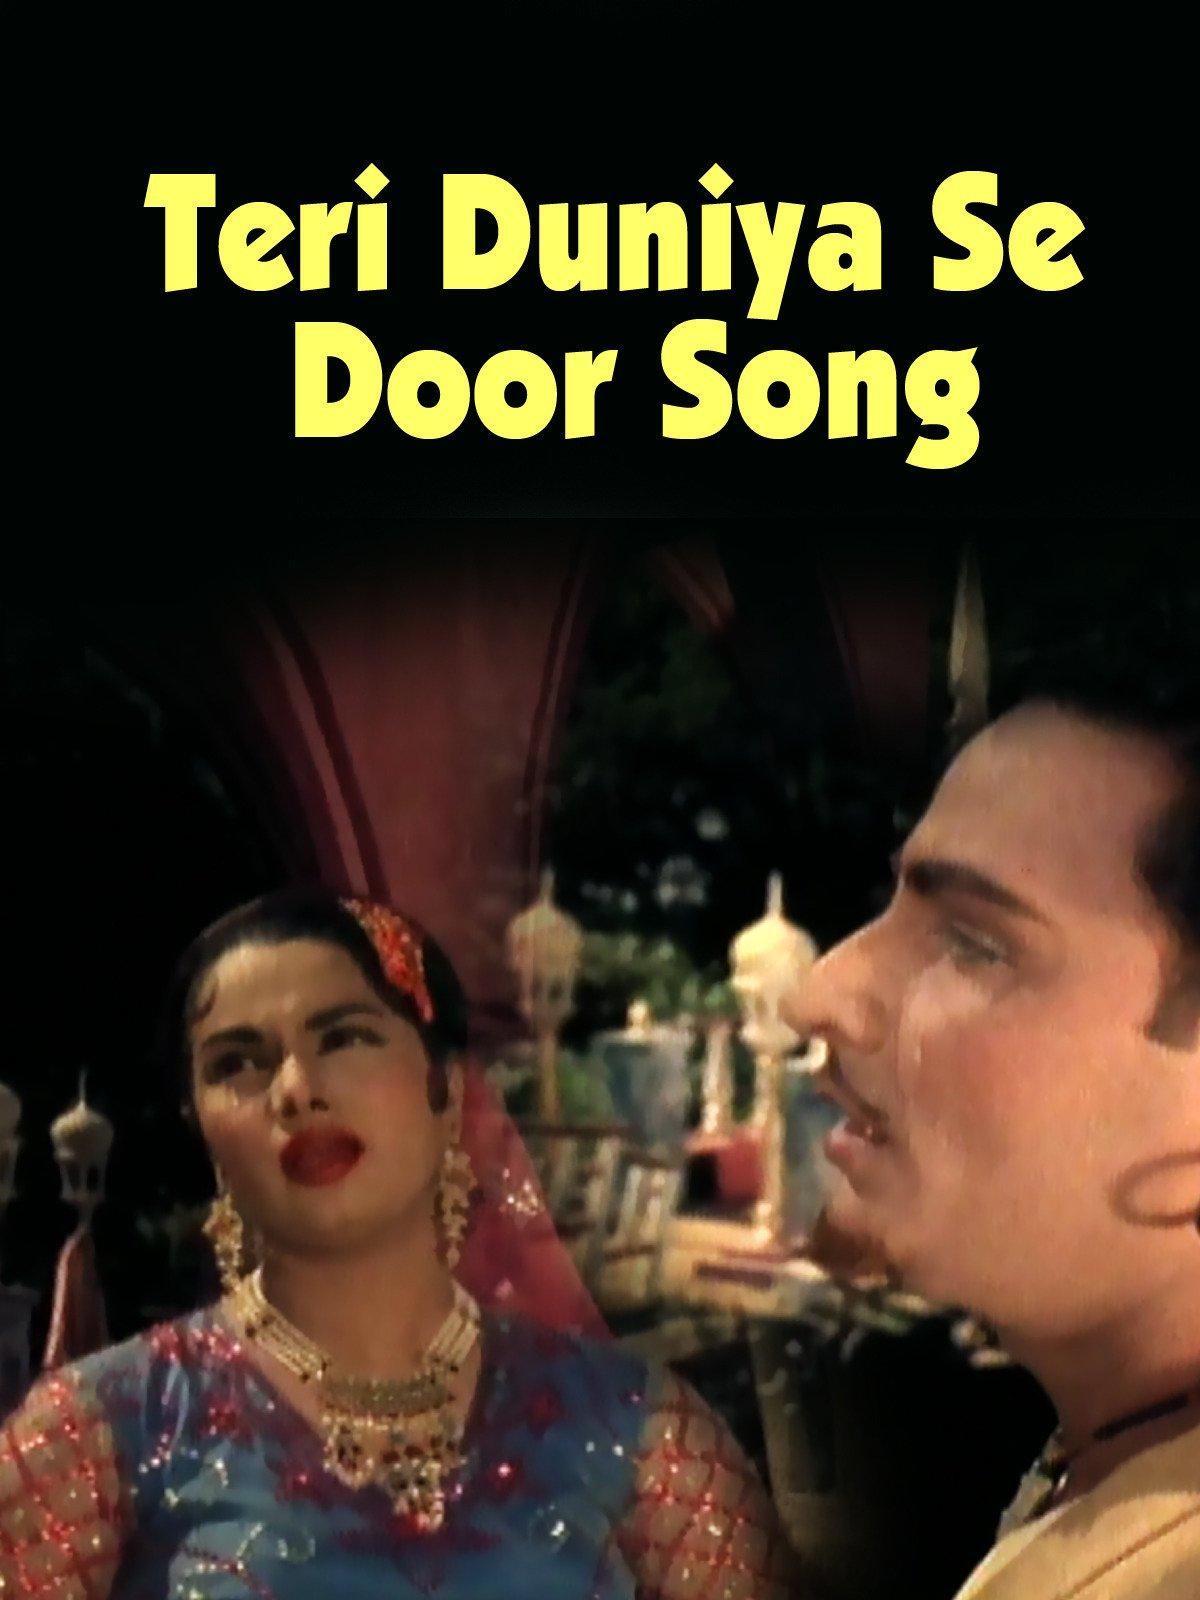 Teri Duniya Se Door Song on Amazon Prime Instant Video UK  sc 1 st  New On Amazon Prime UK & Watch u0027Teri Duniya Se Door Songu0027 on Amazon Prime Instant Video UK ...